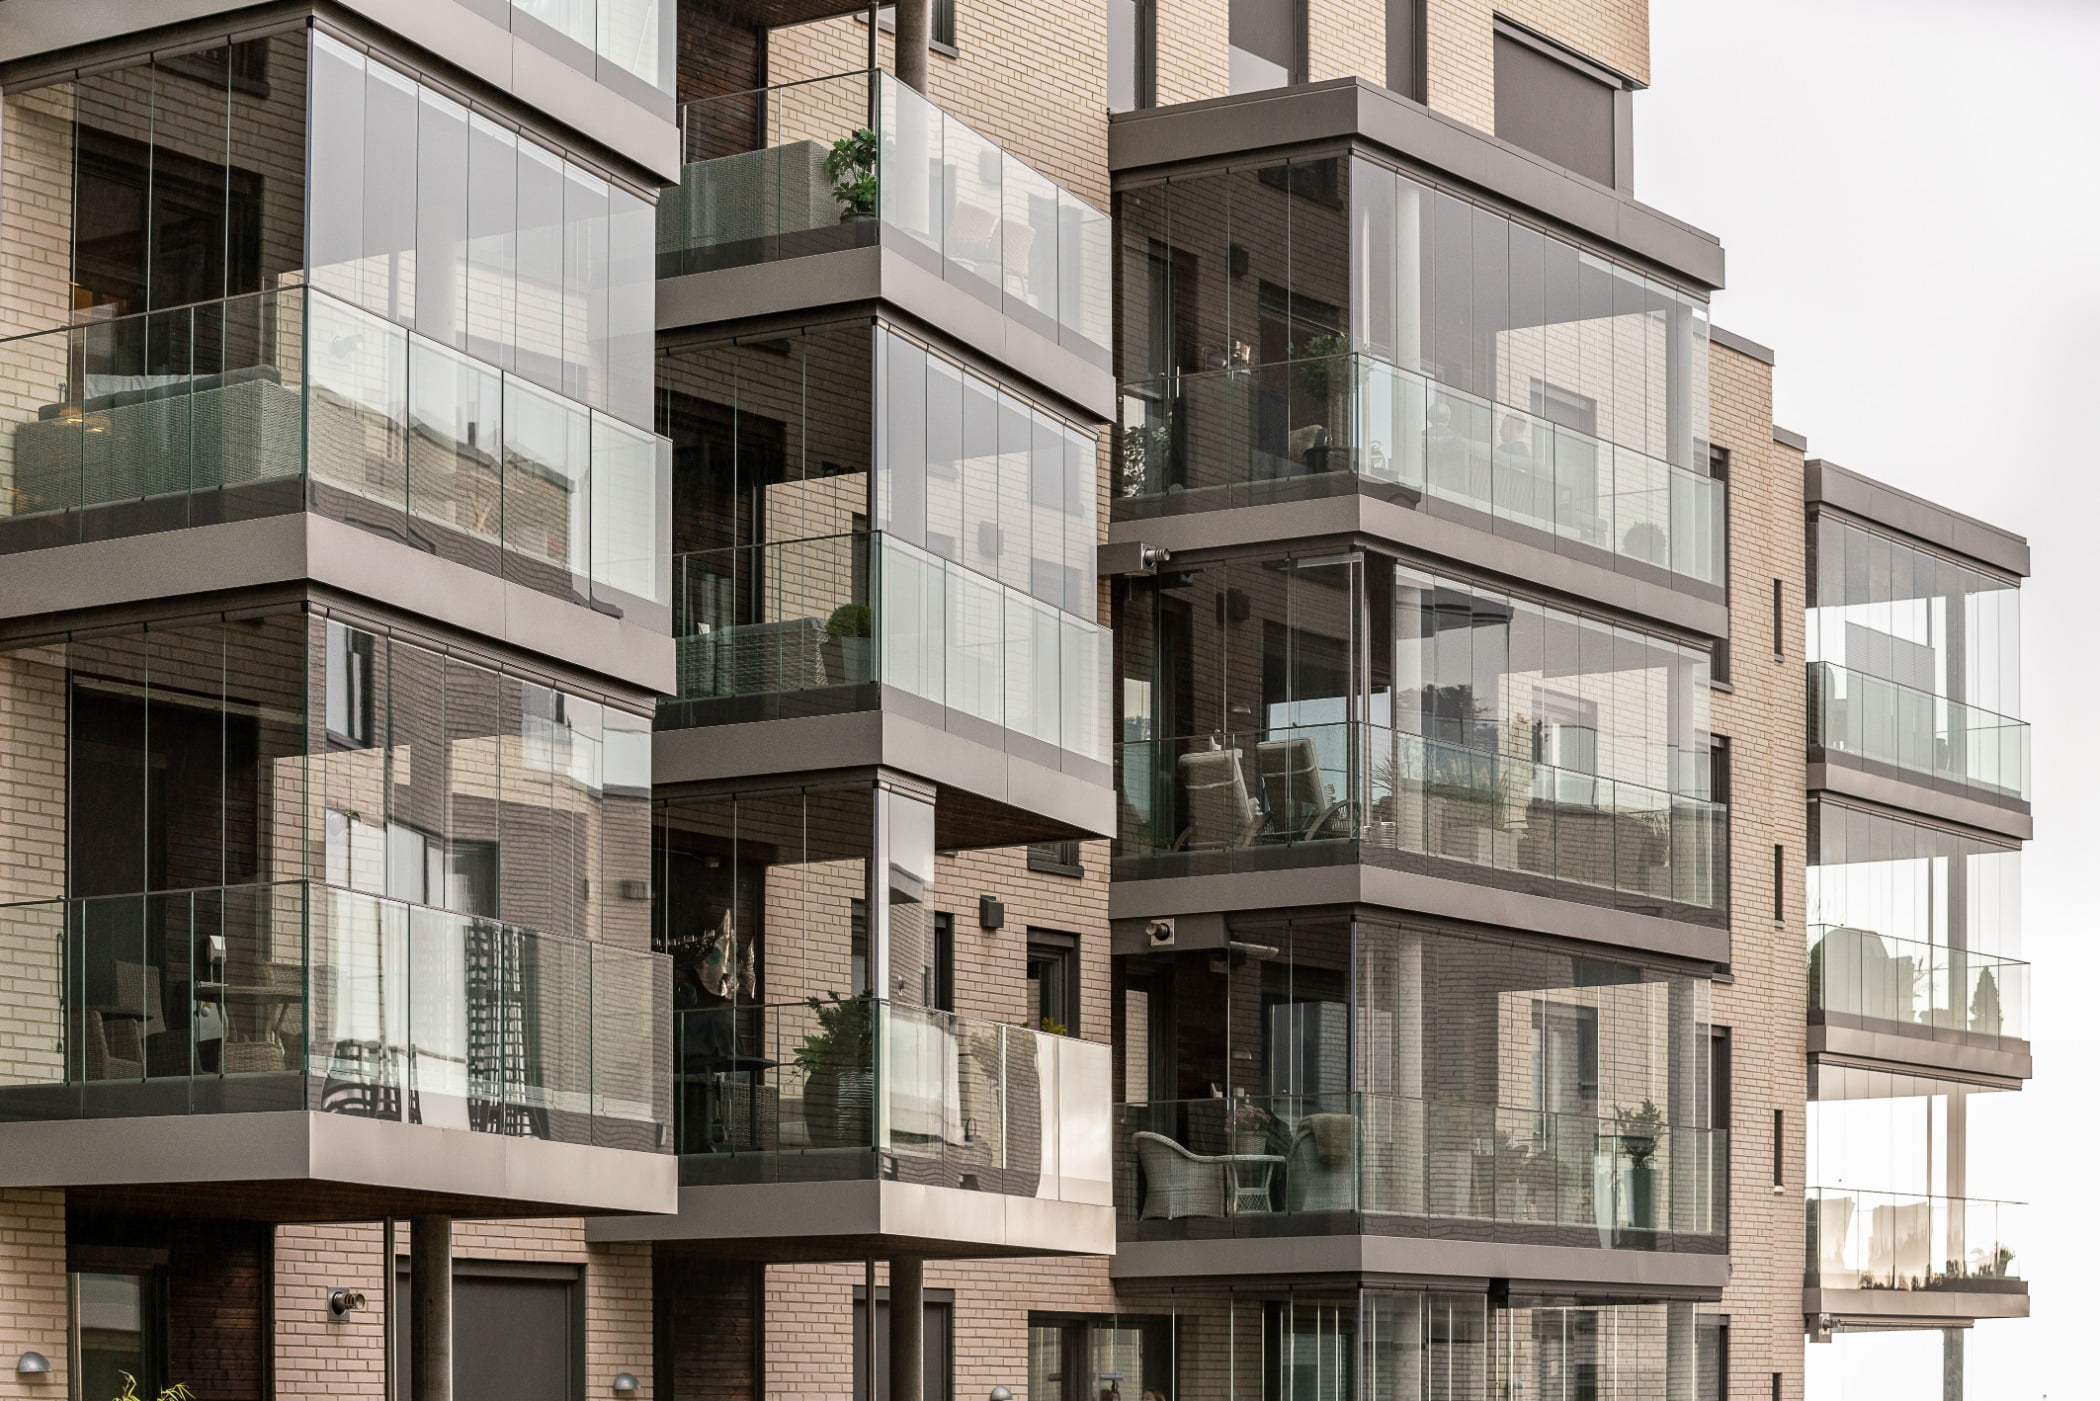 Tower block, Urban design, Residential area, Material property, Building, Condominium, Neighbourhood